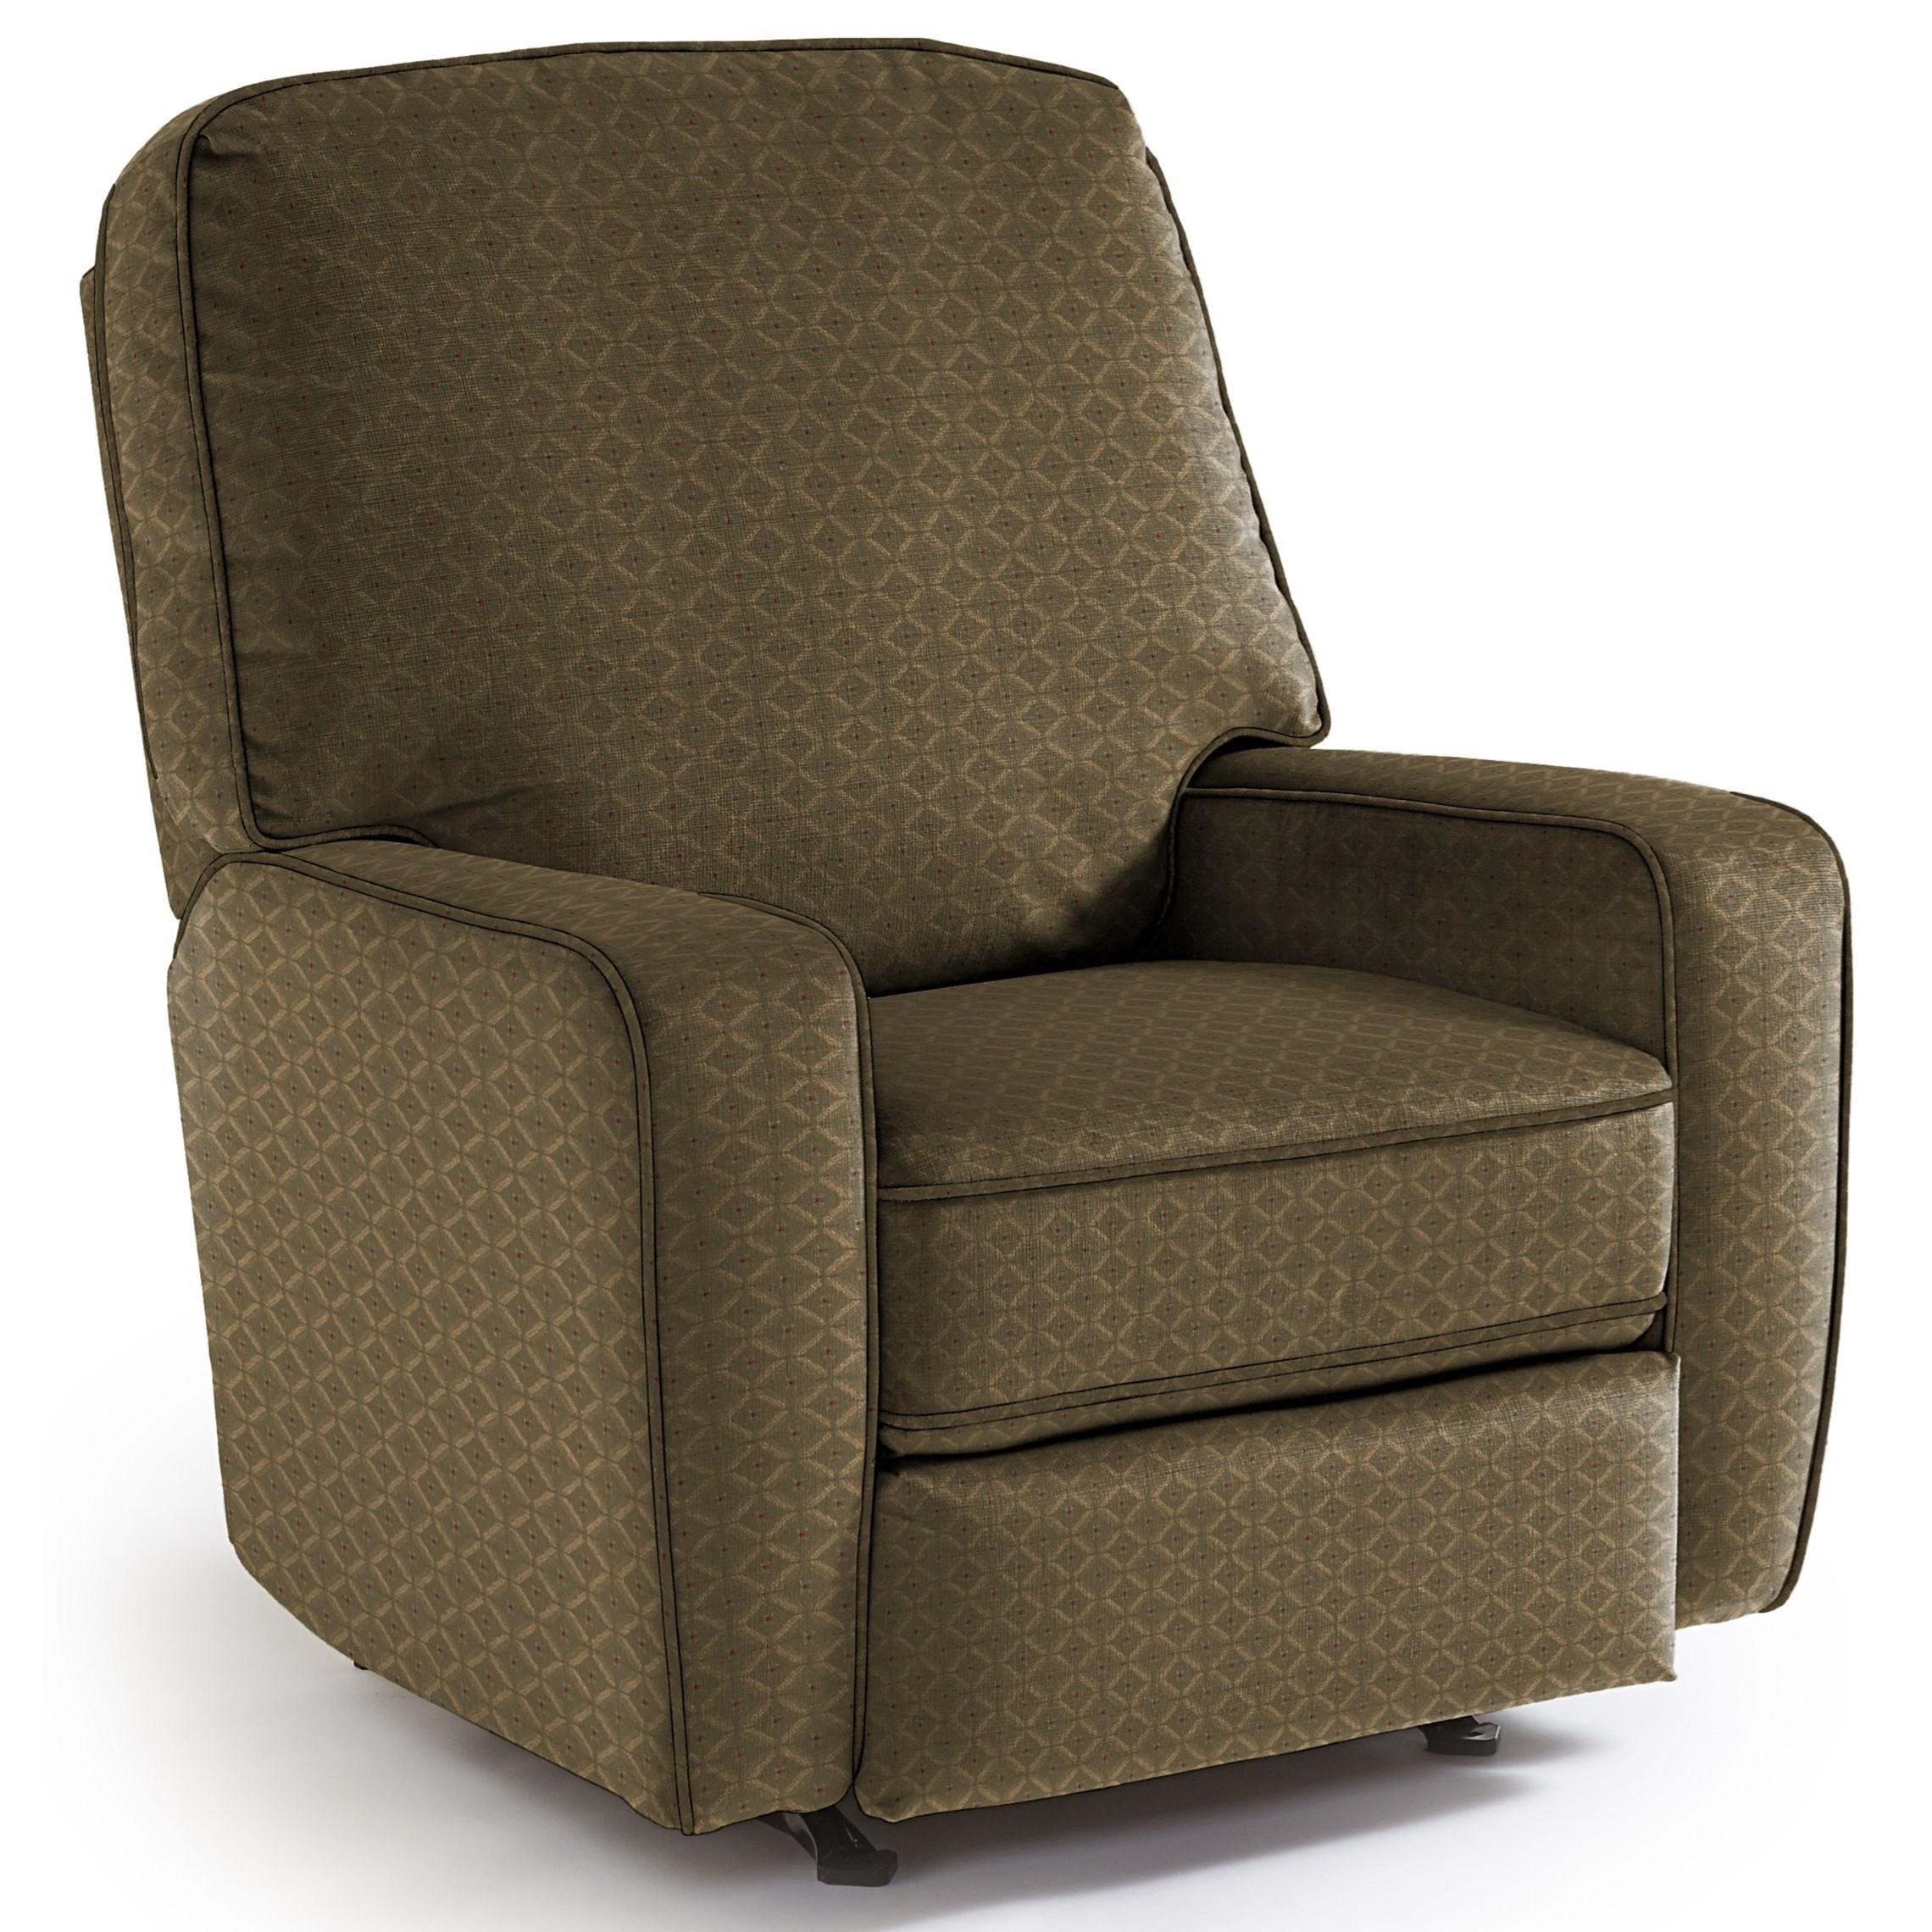 Best Home Furnishings Recliners - Medium Bilana Recliner - Item Number: -1570559765-18021